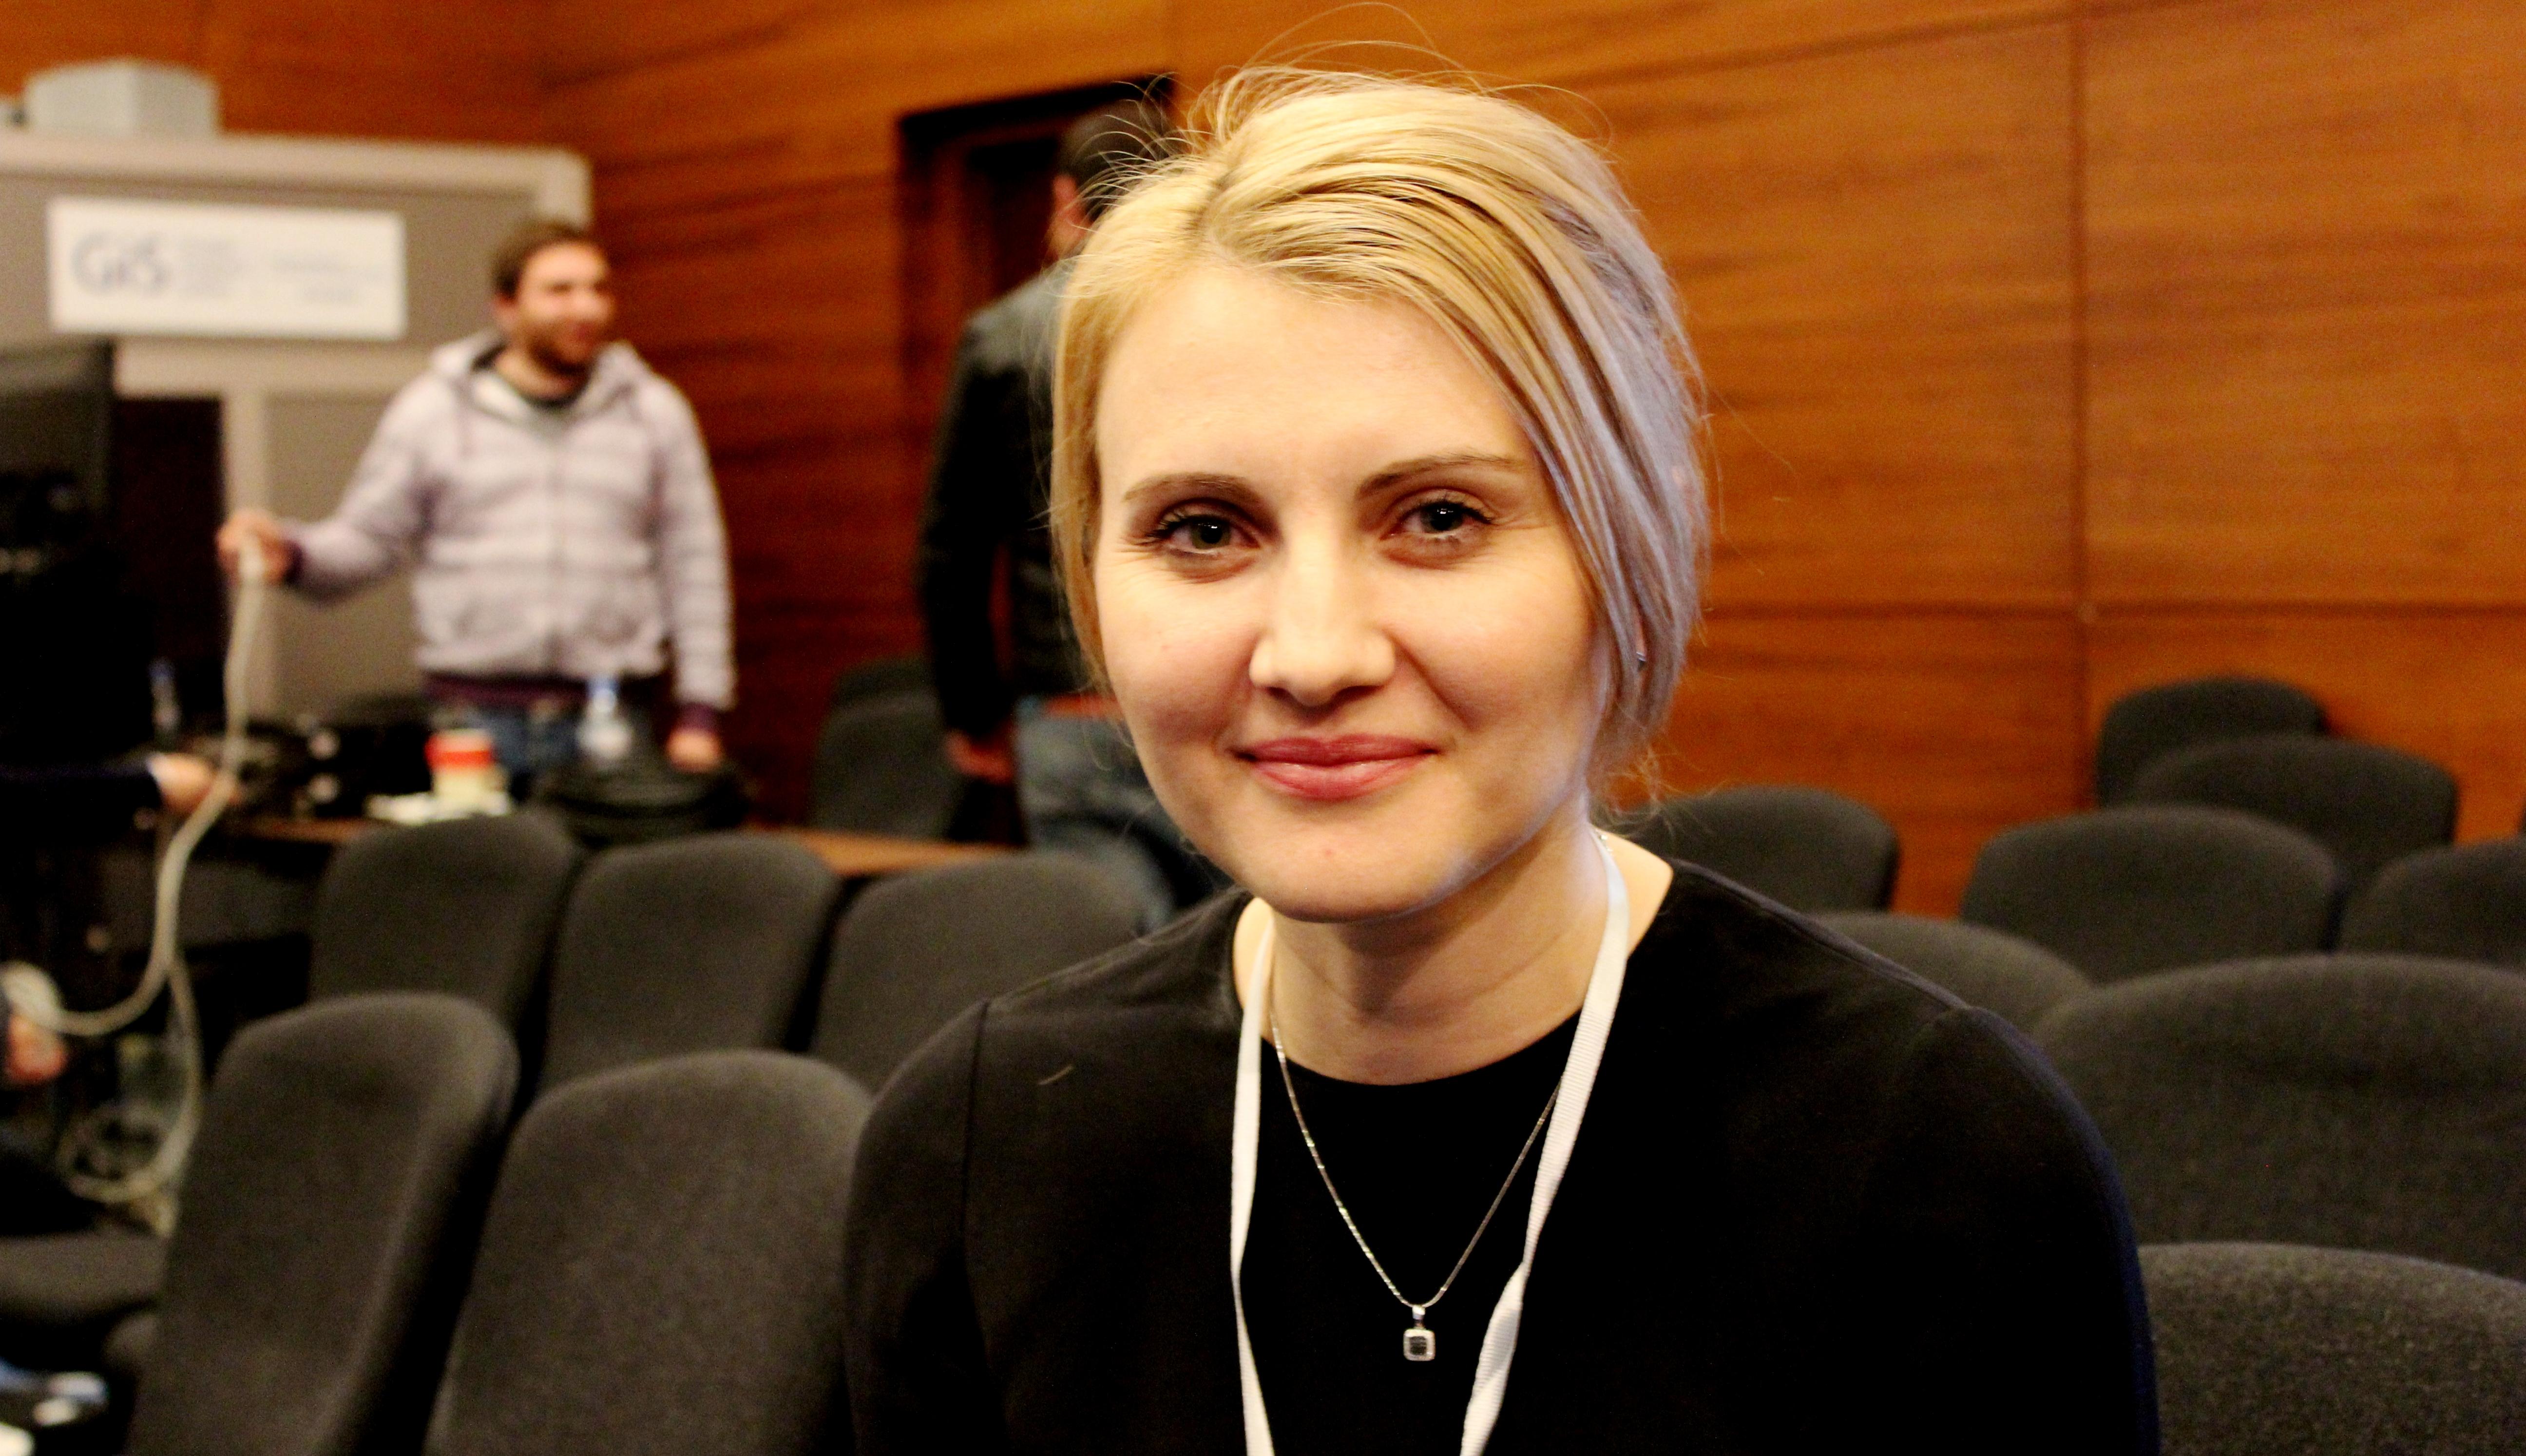 Елена Марзак, директор центра информирования и документирования НАТО в Молдове